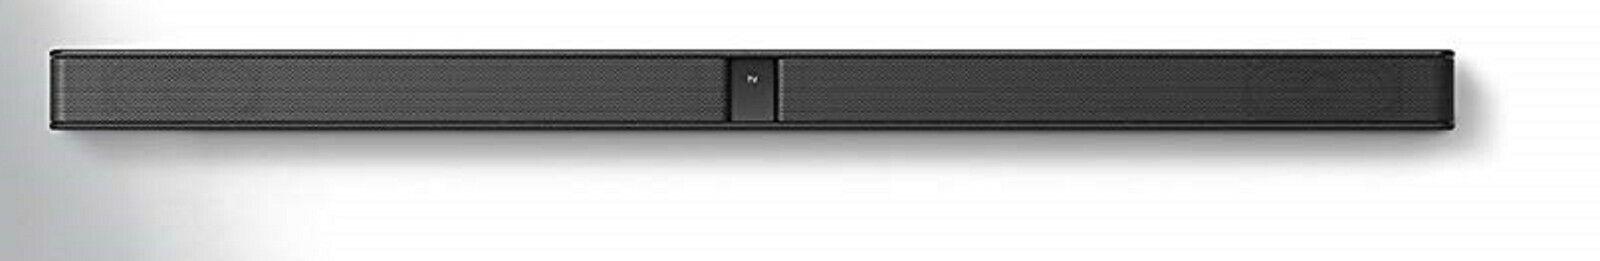 Sony Ultra-slim 300W Sound bar SA-CT290 - Not Pair, Soundbar Only